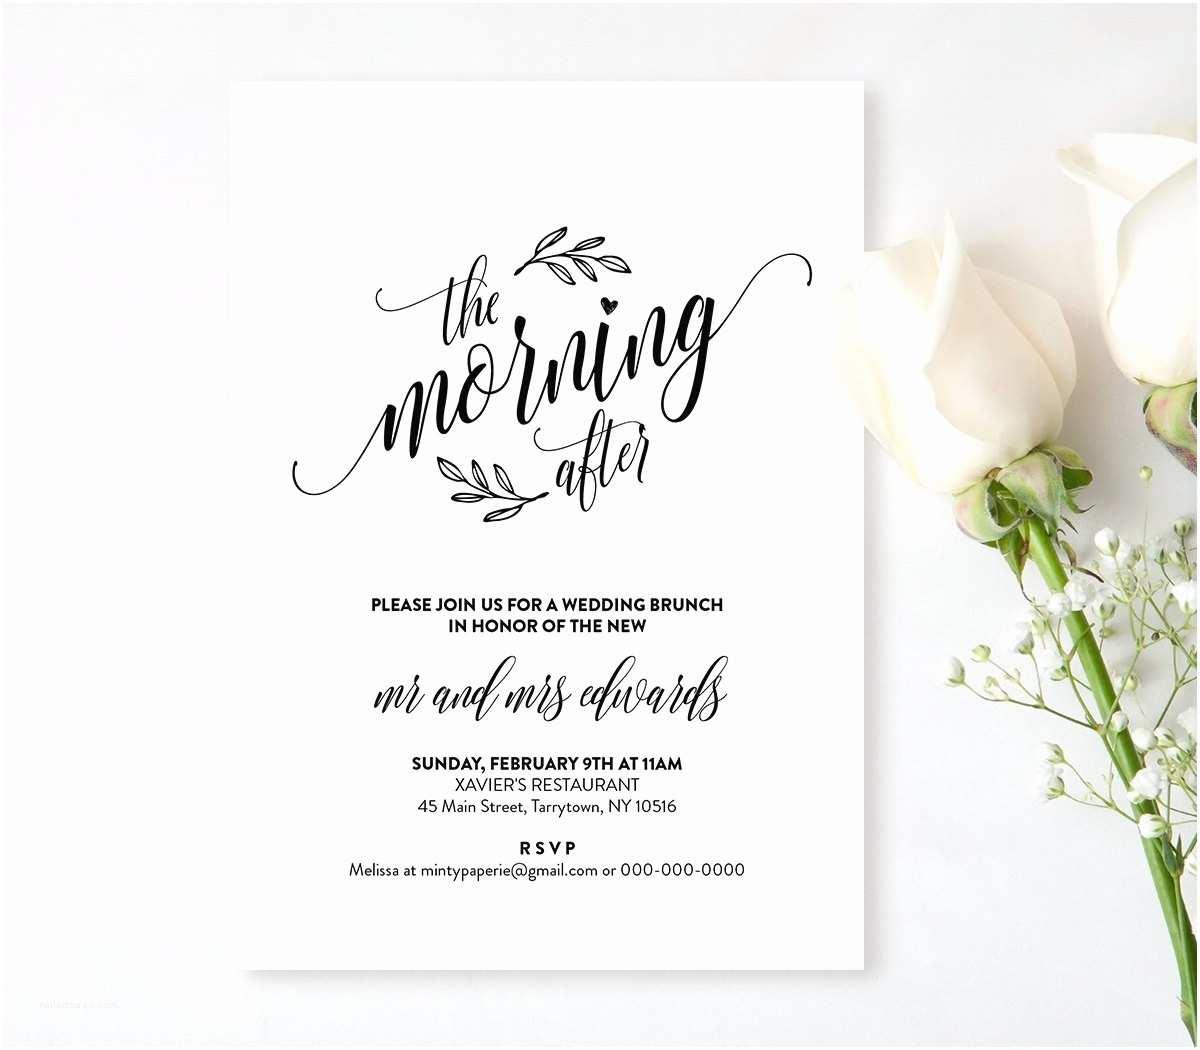 Post Wedding Brunch Invitation Wording Wedding Brunch Invitation Template Printable Post Wedding